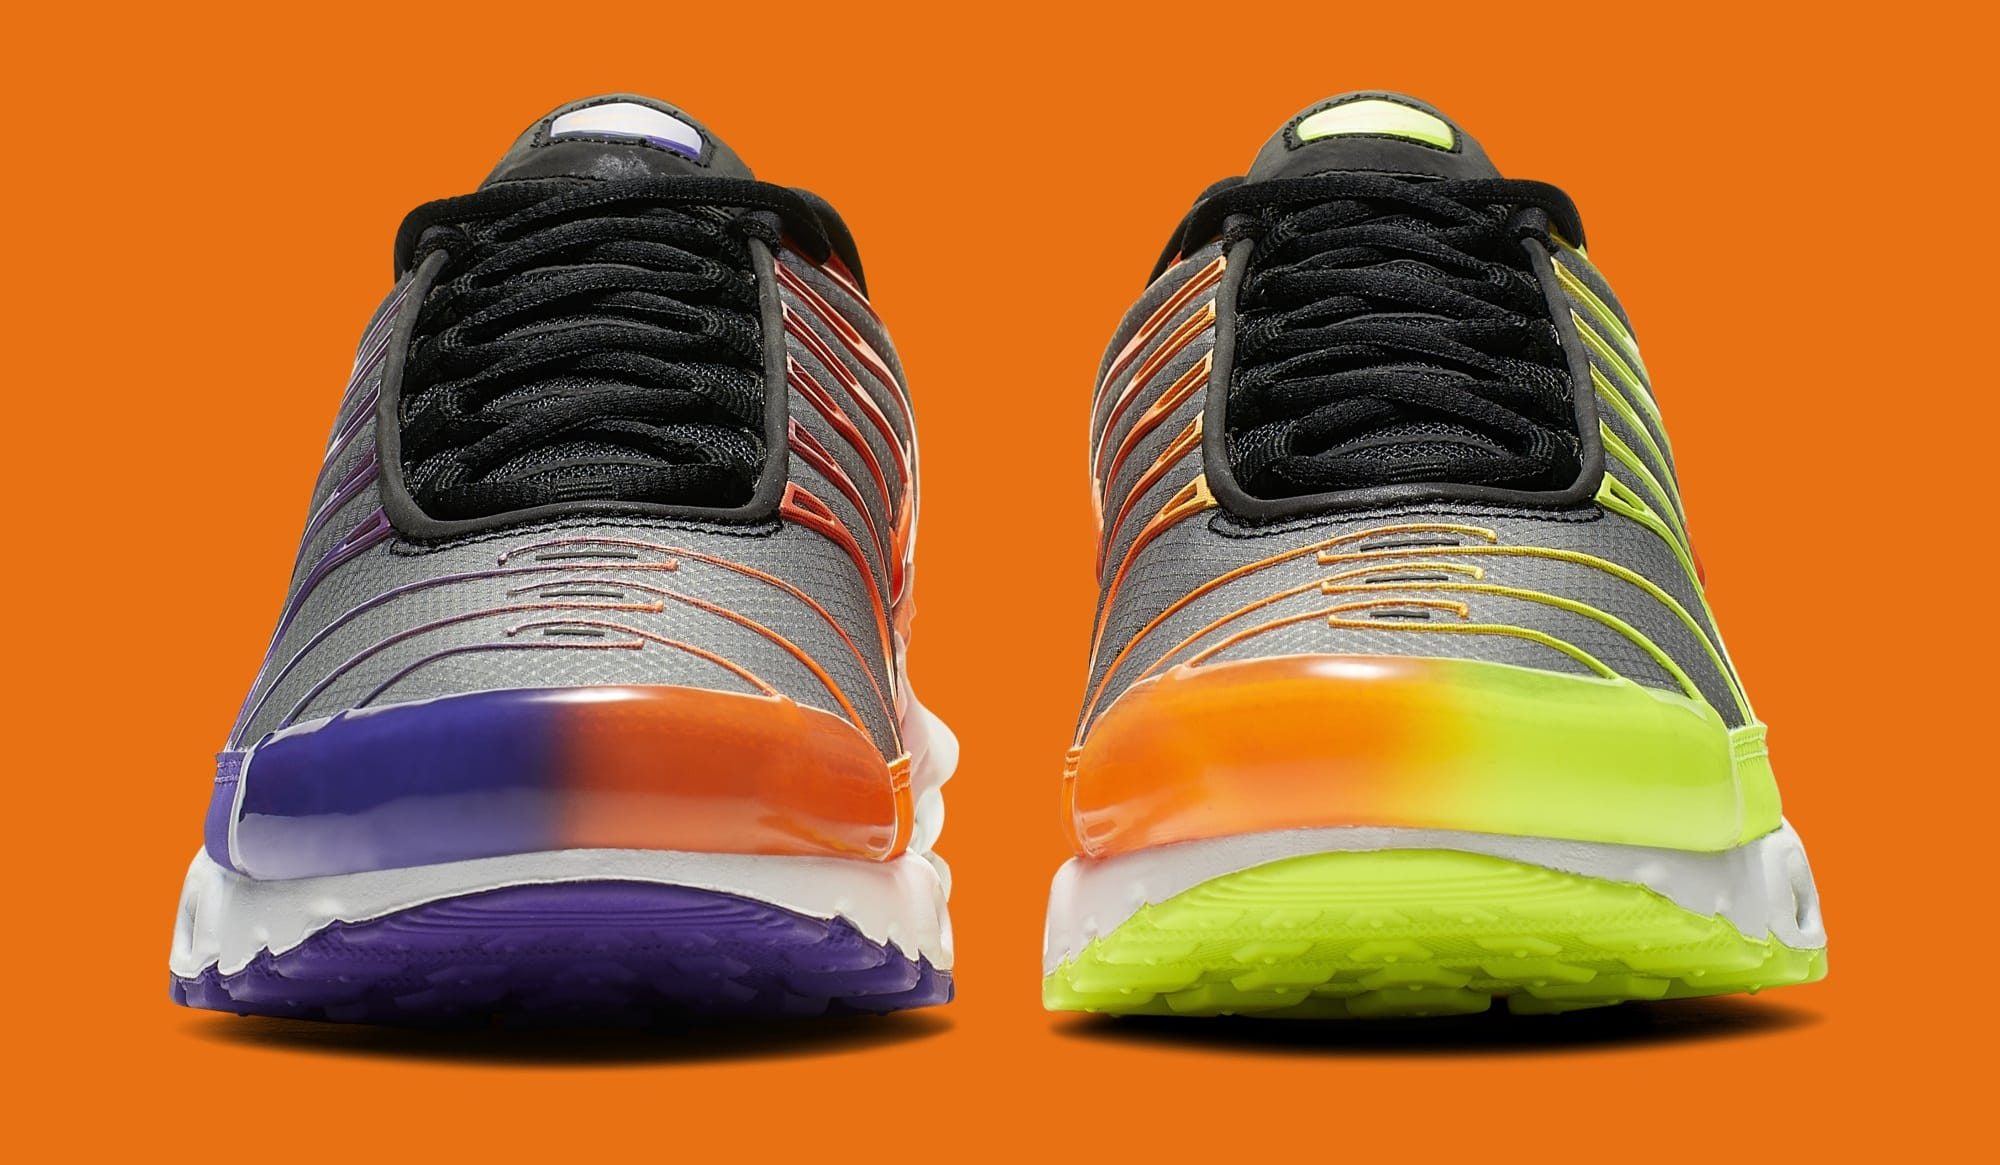 Nike Air Max Plus 'Color Flip/Black' CI5924-061 (Toe)